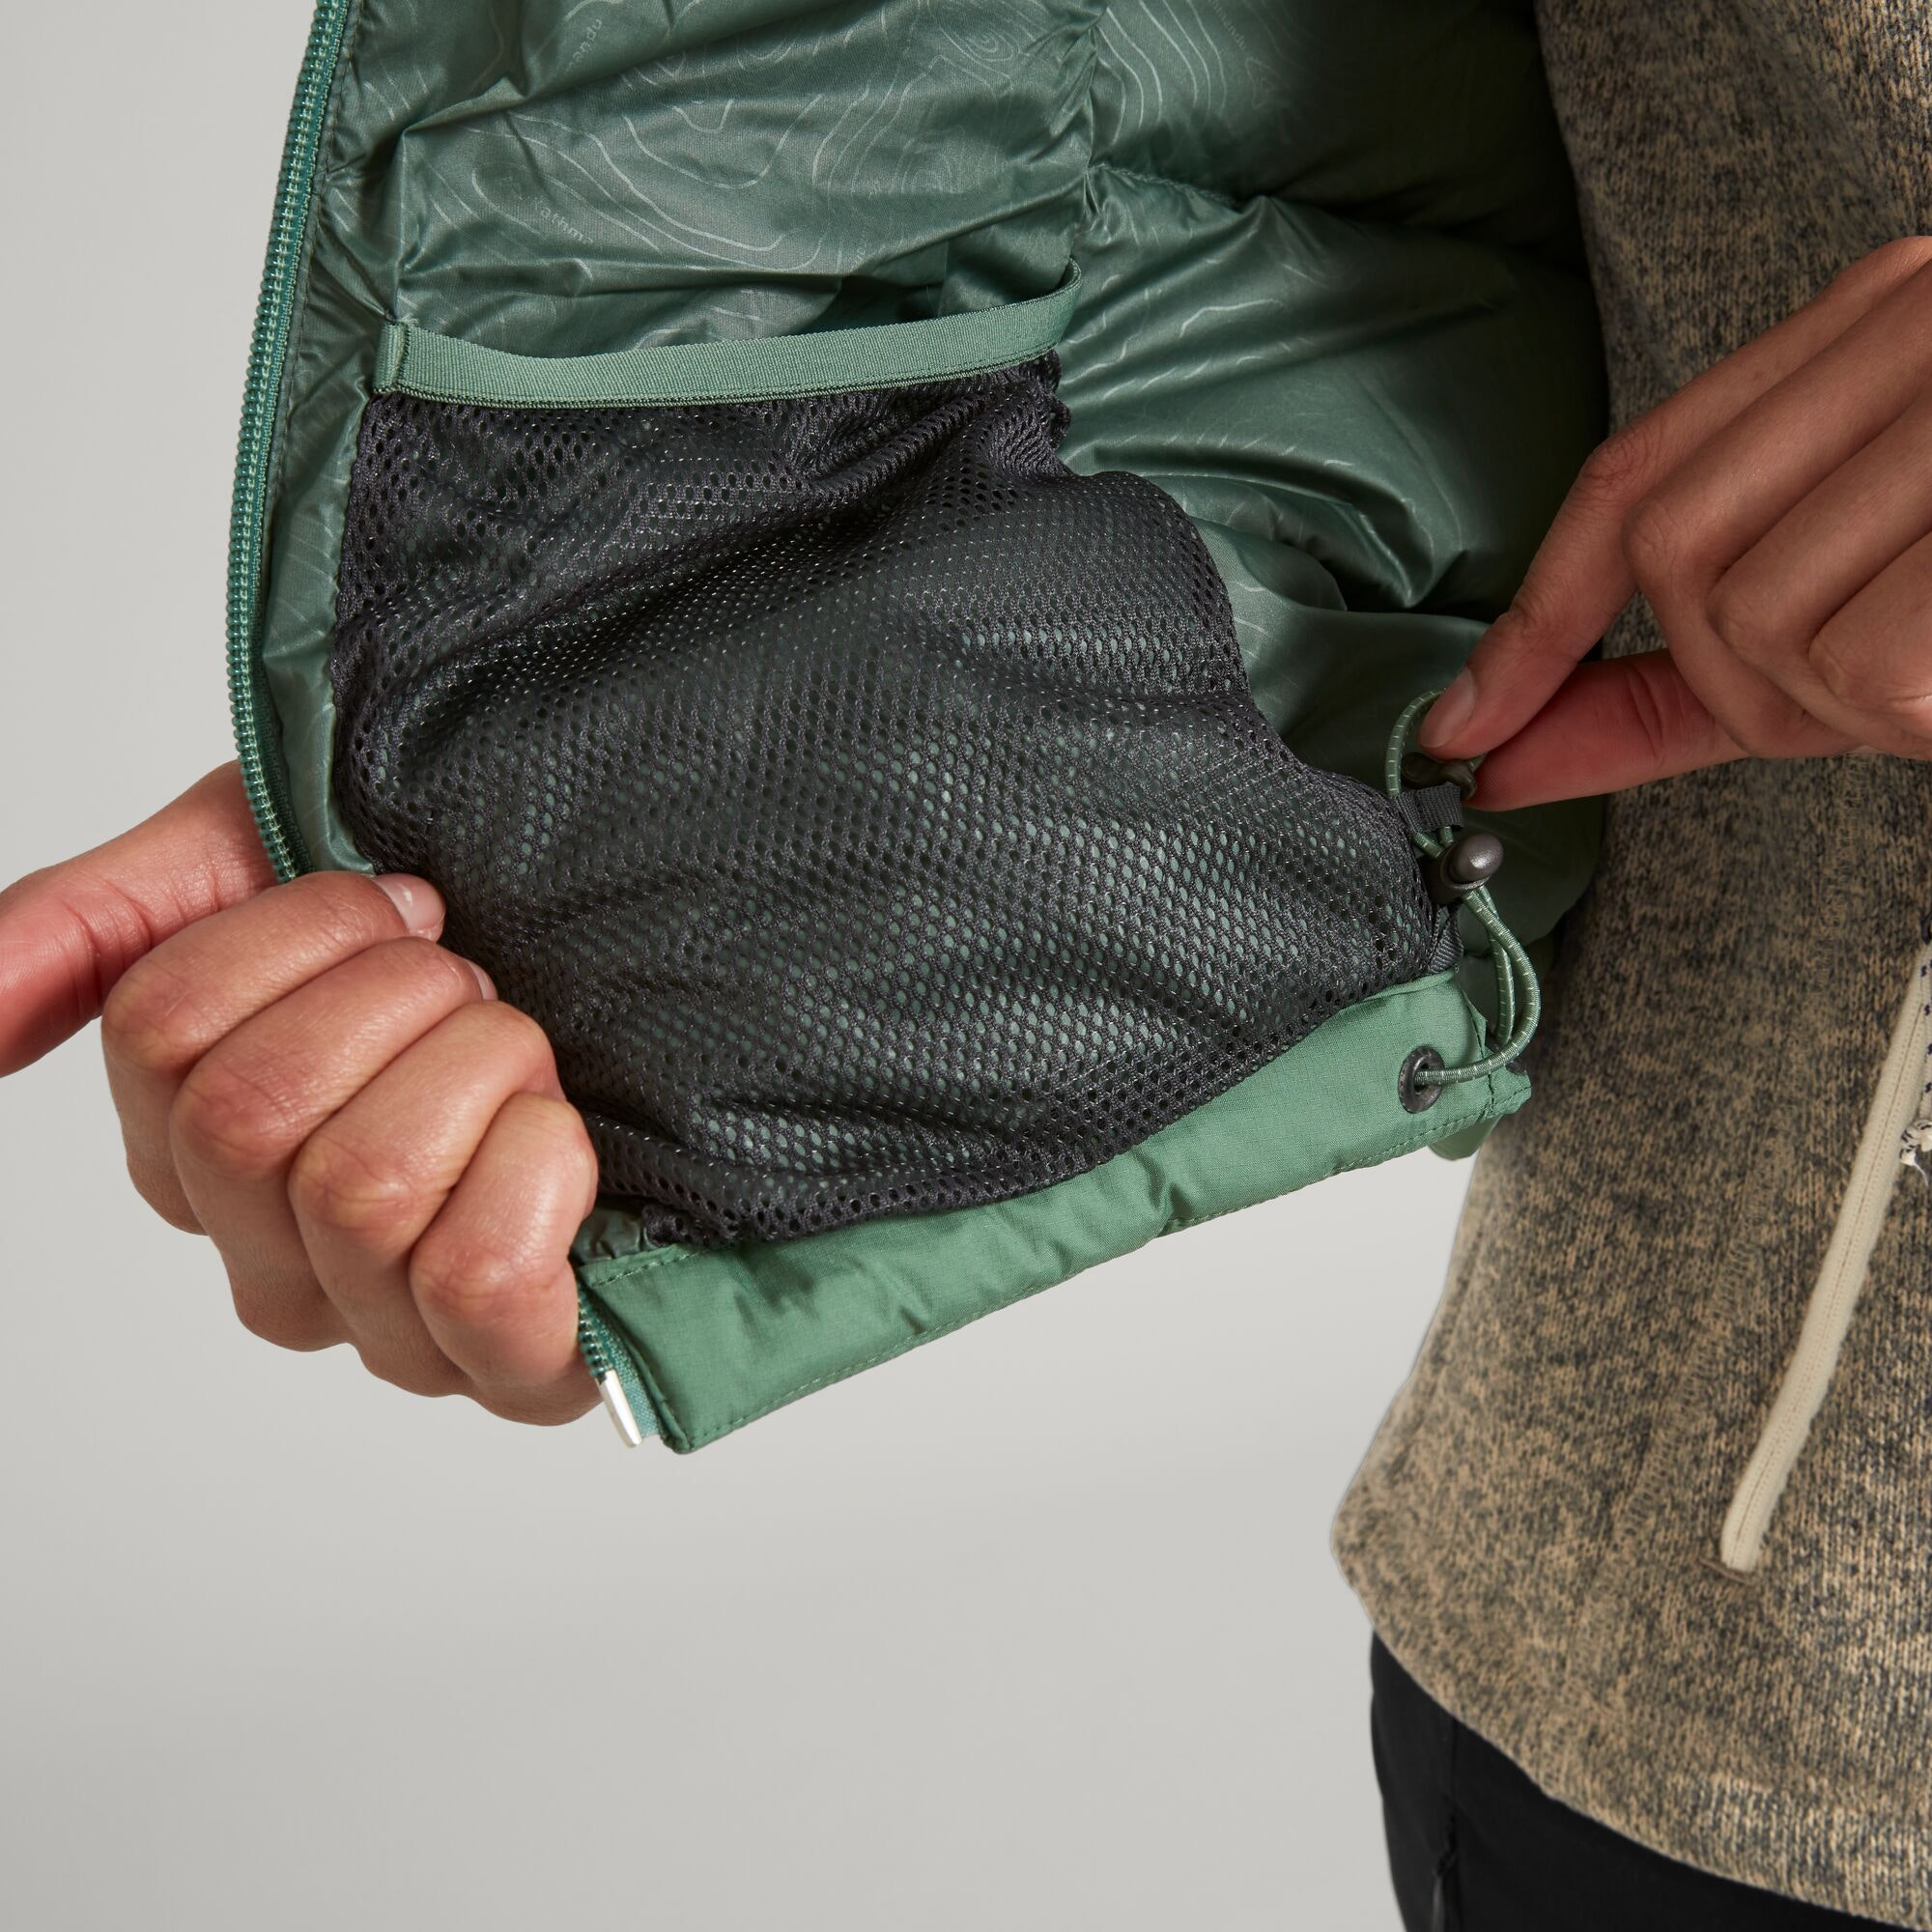 thumbnail 44 - NEW Kathmandu Epiq Womens Hooded Down Puffer 600 Fill Warm Outdoor Winter Jacket